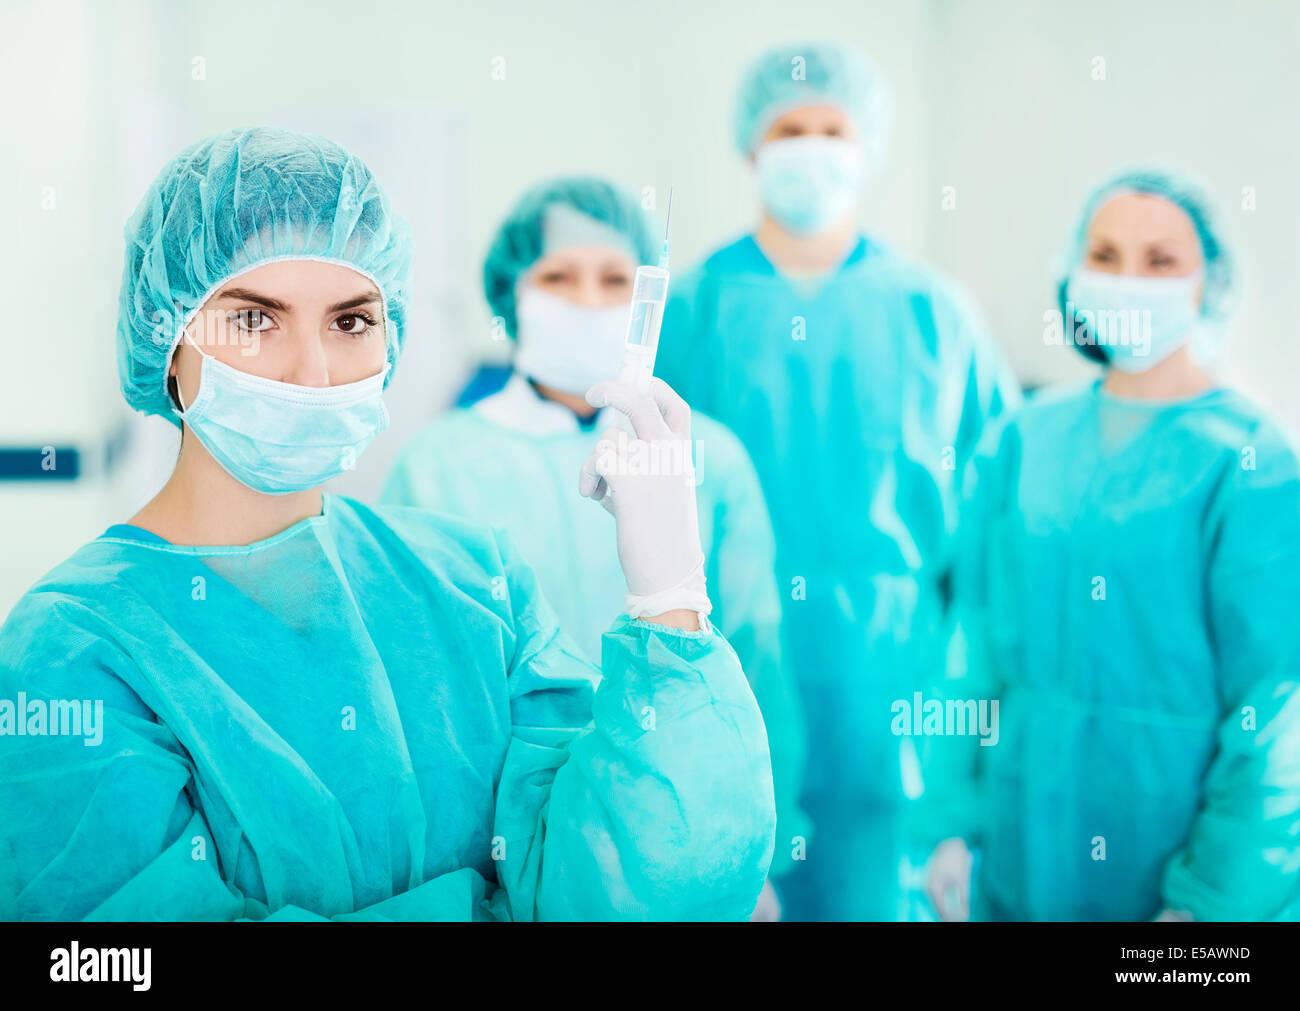 Ready for surgery Debica, Poland - Stock Image